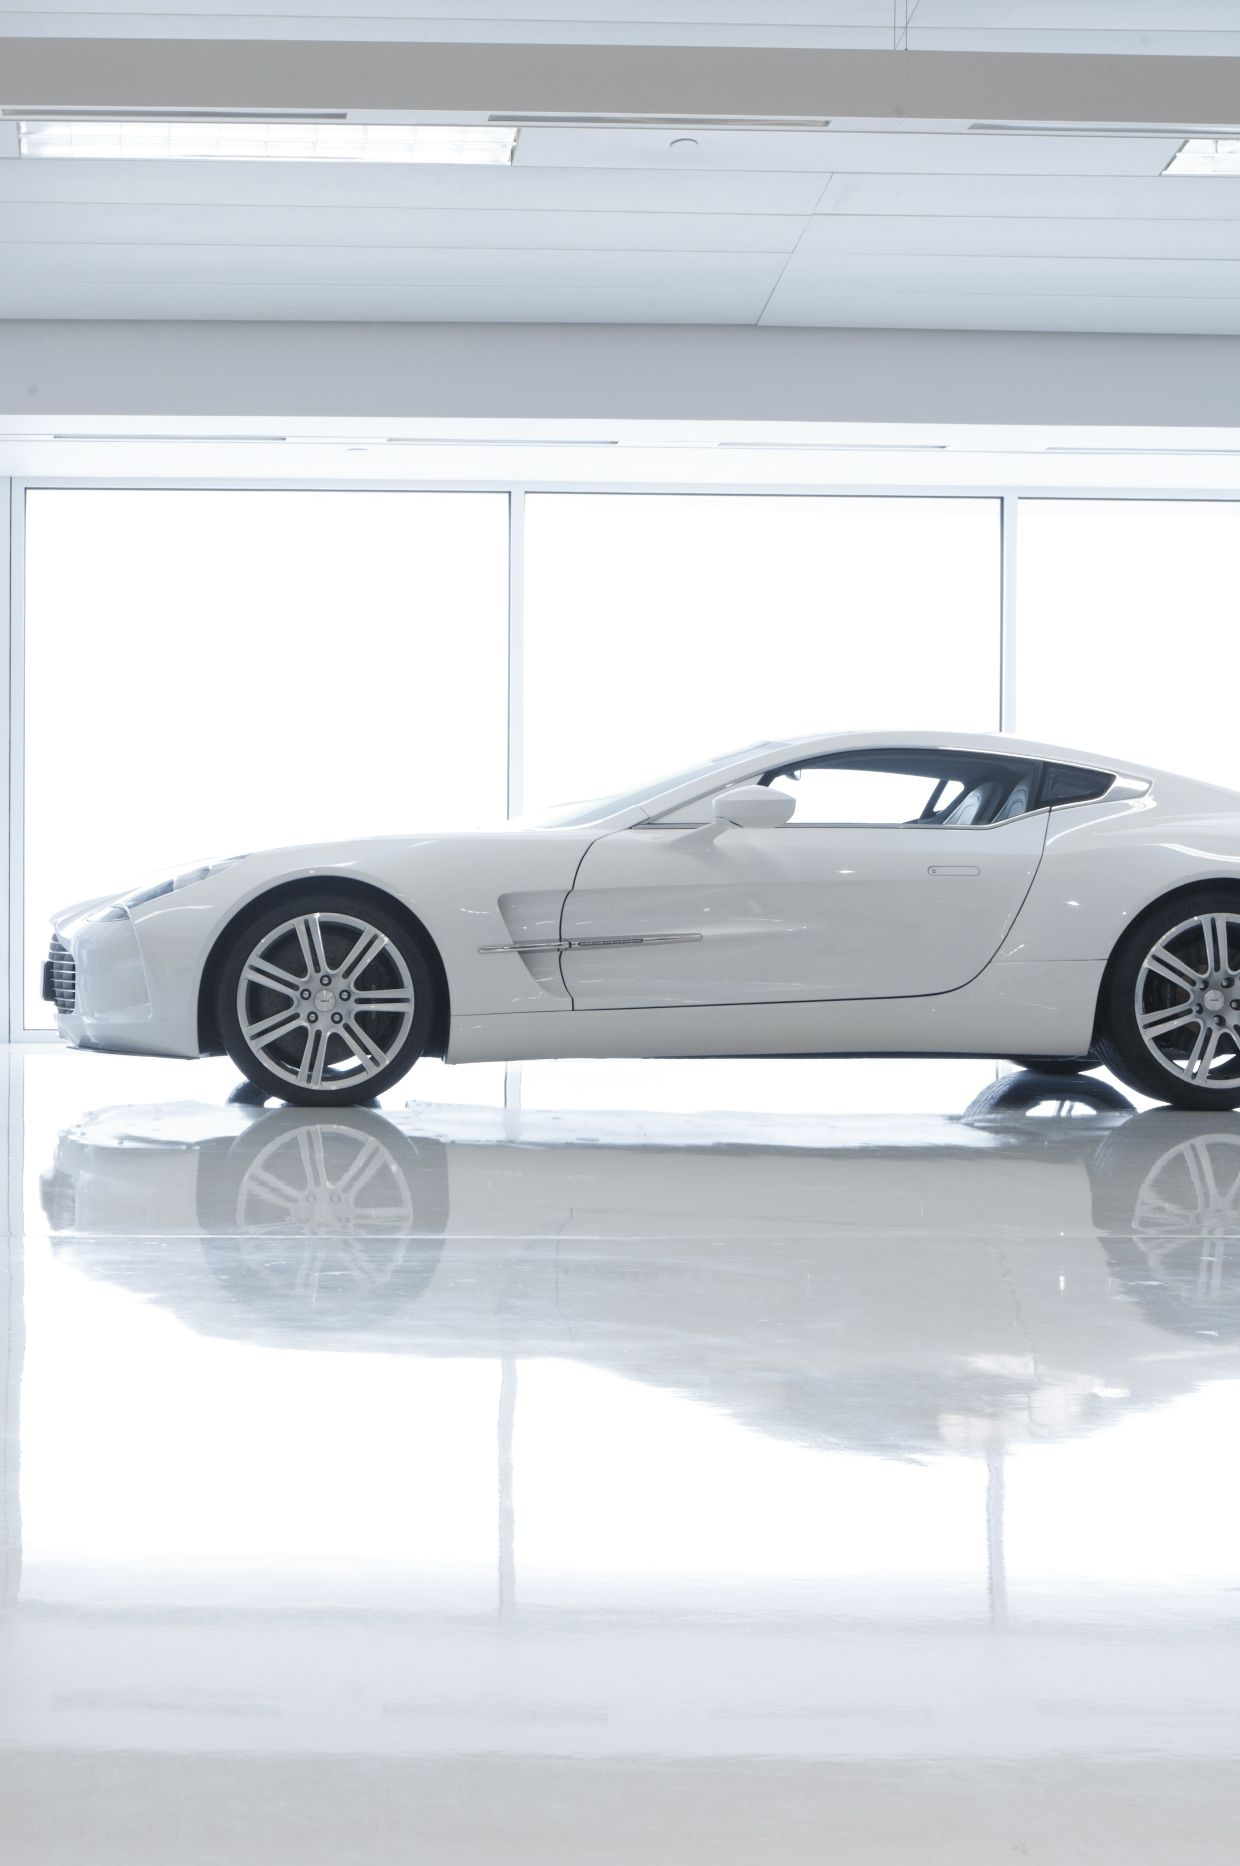 Call Center Service Solahart Telp 021 71231659 Mobile 082113812149 Cv Fikri Mandiri Jaya Alamat Jalan Raya P Sports Cars Luxury Aston Martin Dream Cars